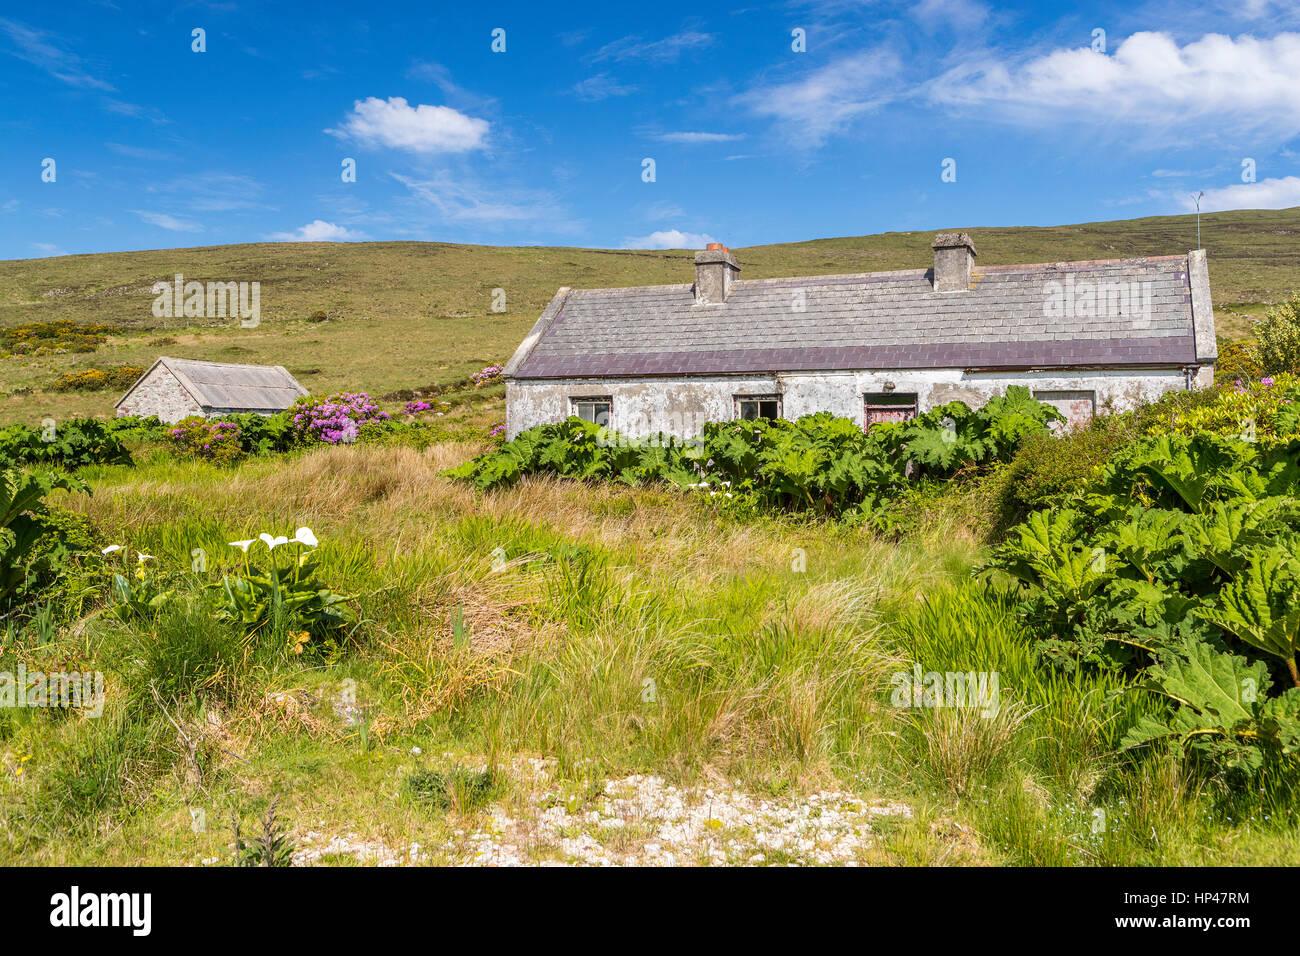 Old Cottage at Achill Island, County Mayo, Ireland, Europe. - Stock Image